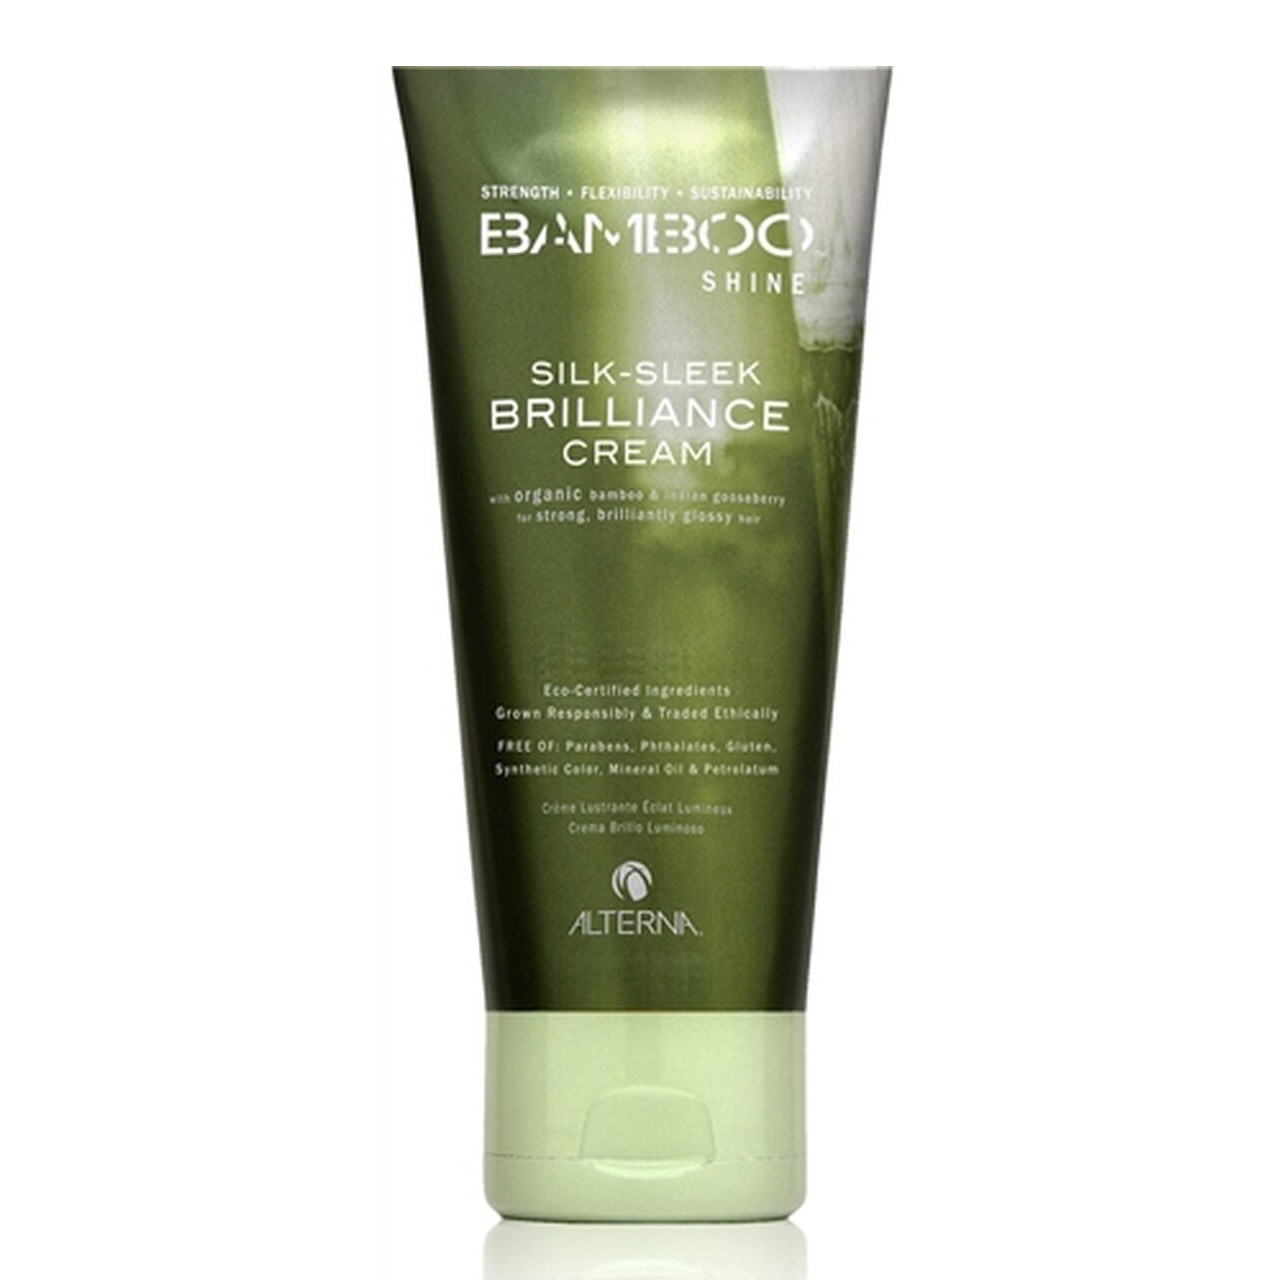 Alterna Bamboo Silk-Sleek Brilliance Cream